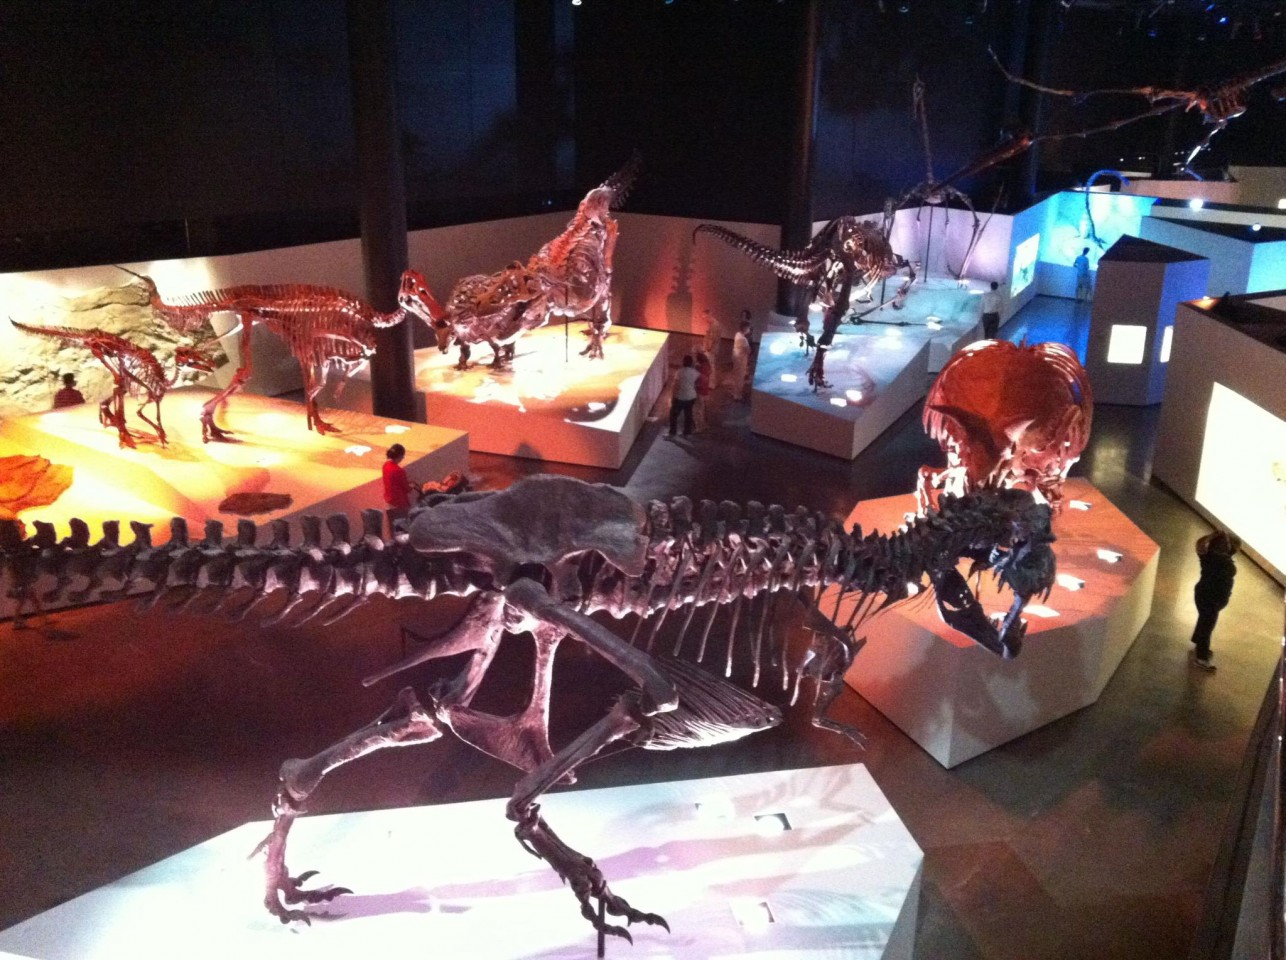 Houston Museum of Natural Science(ヒューストン自然科学博物館)